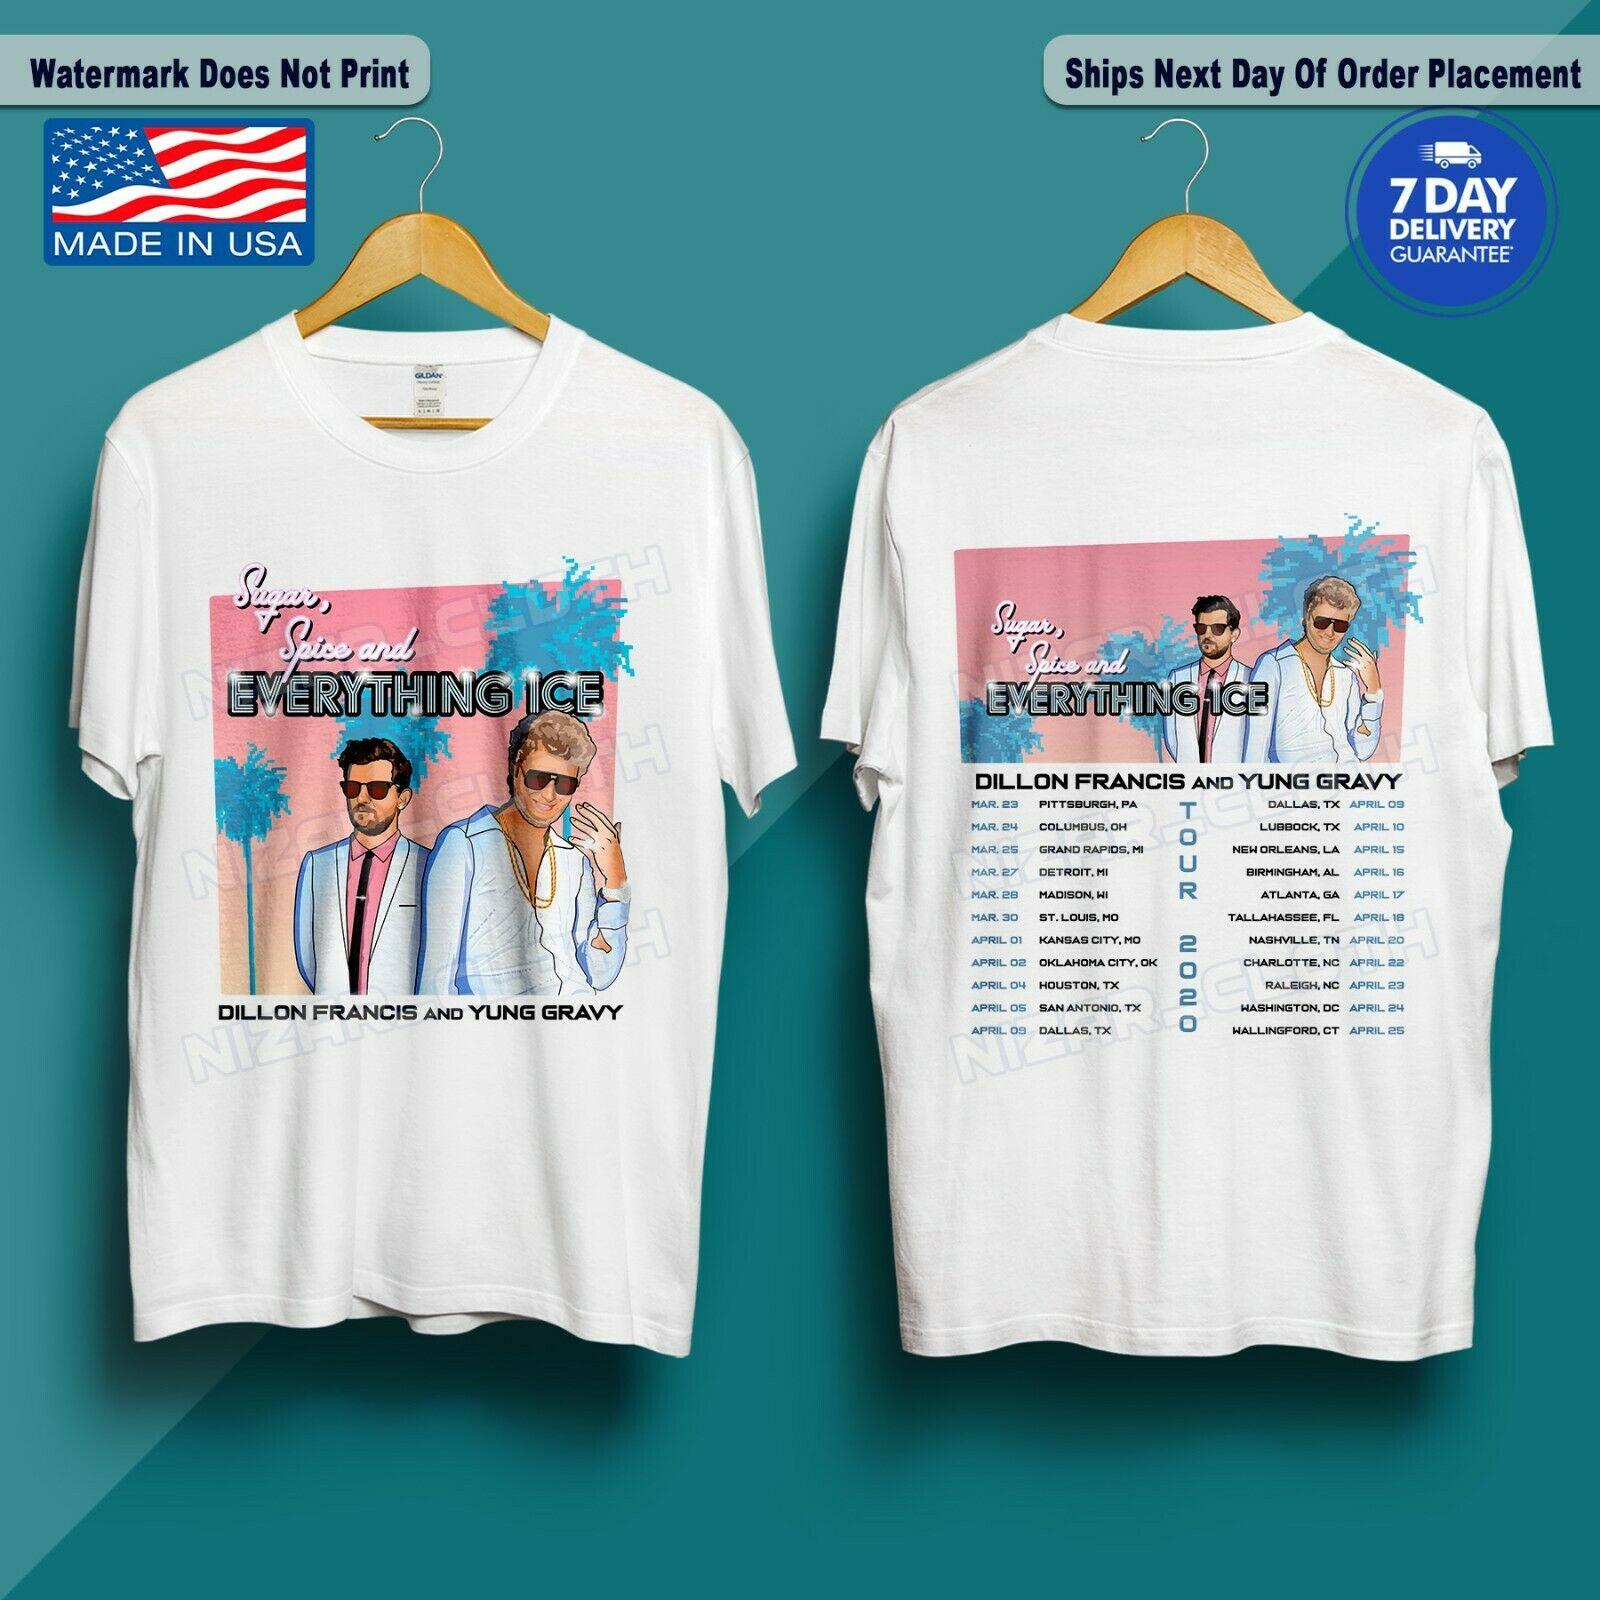 Camiseta dillon francis x yung molho 2020 açúcar, especiarias e tudo gelo tour